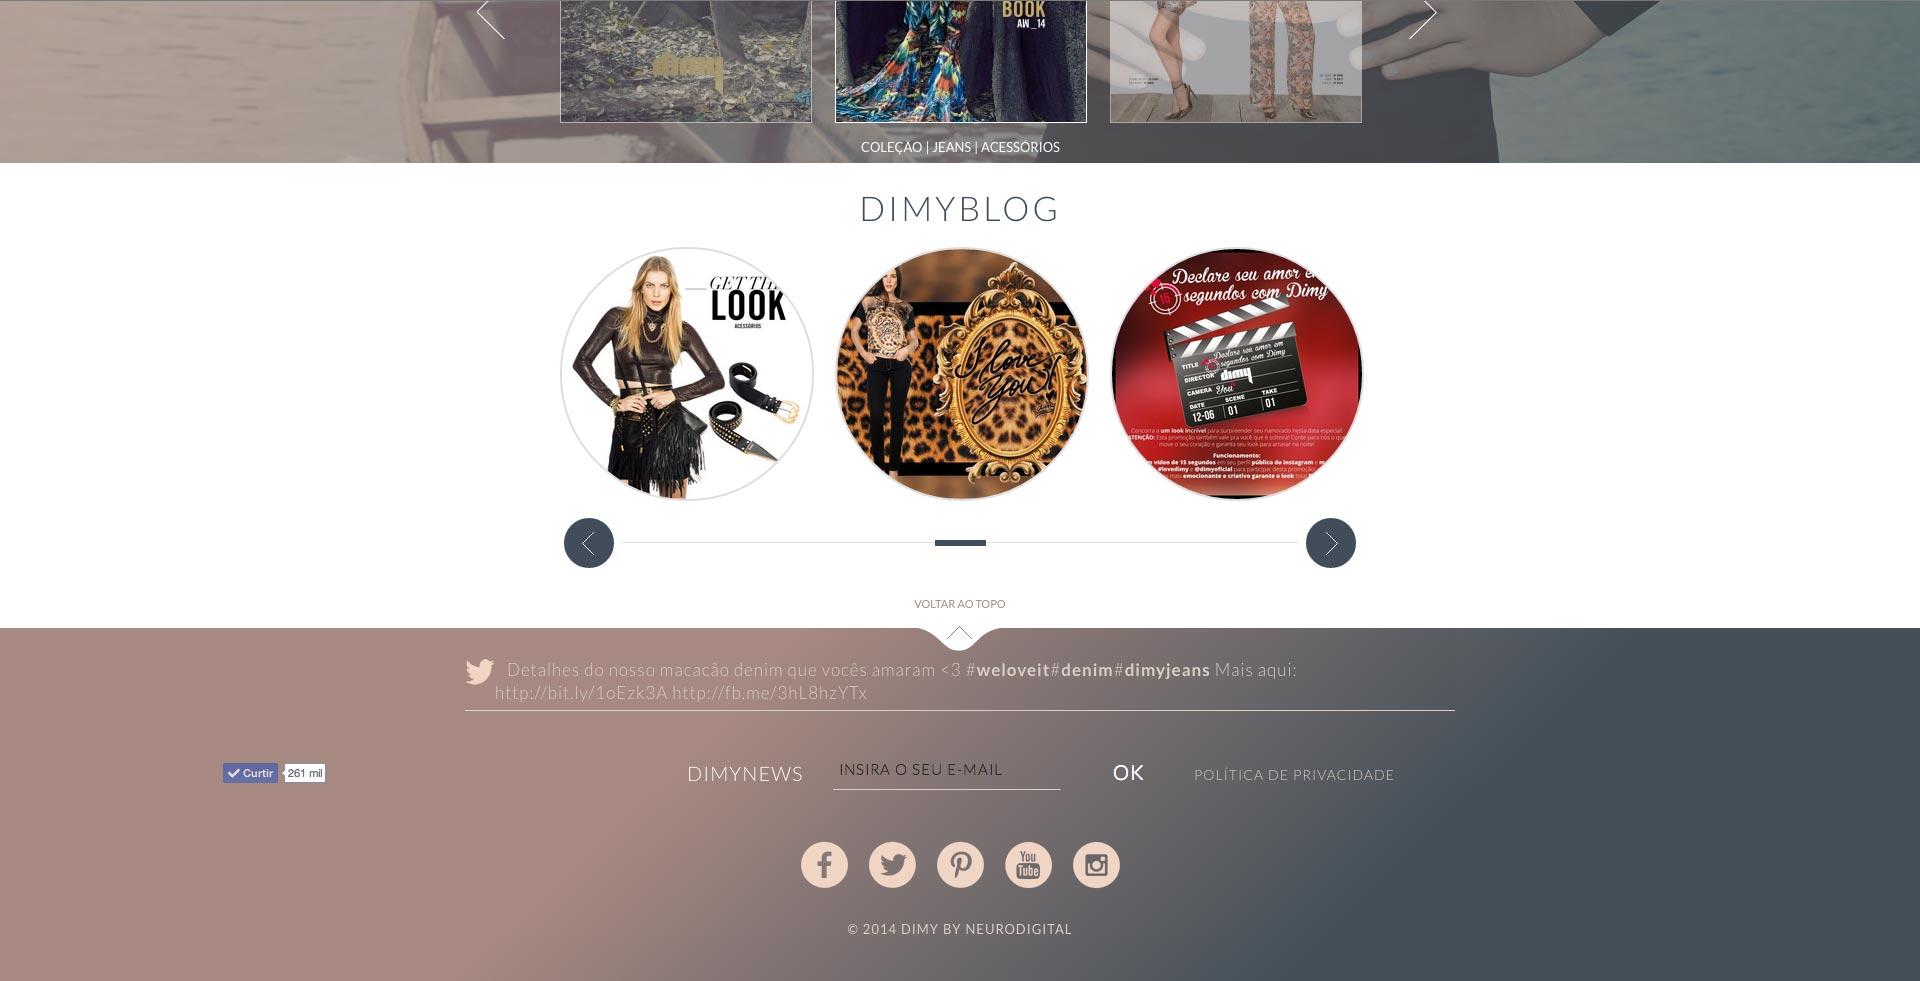 Dimy - Blog na home